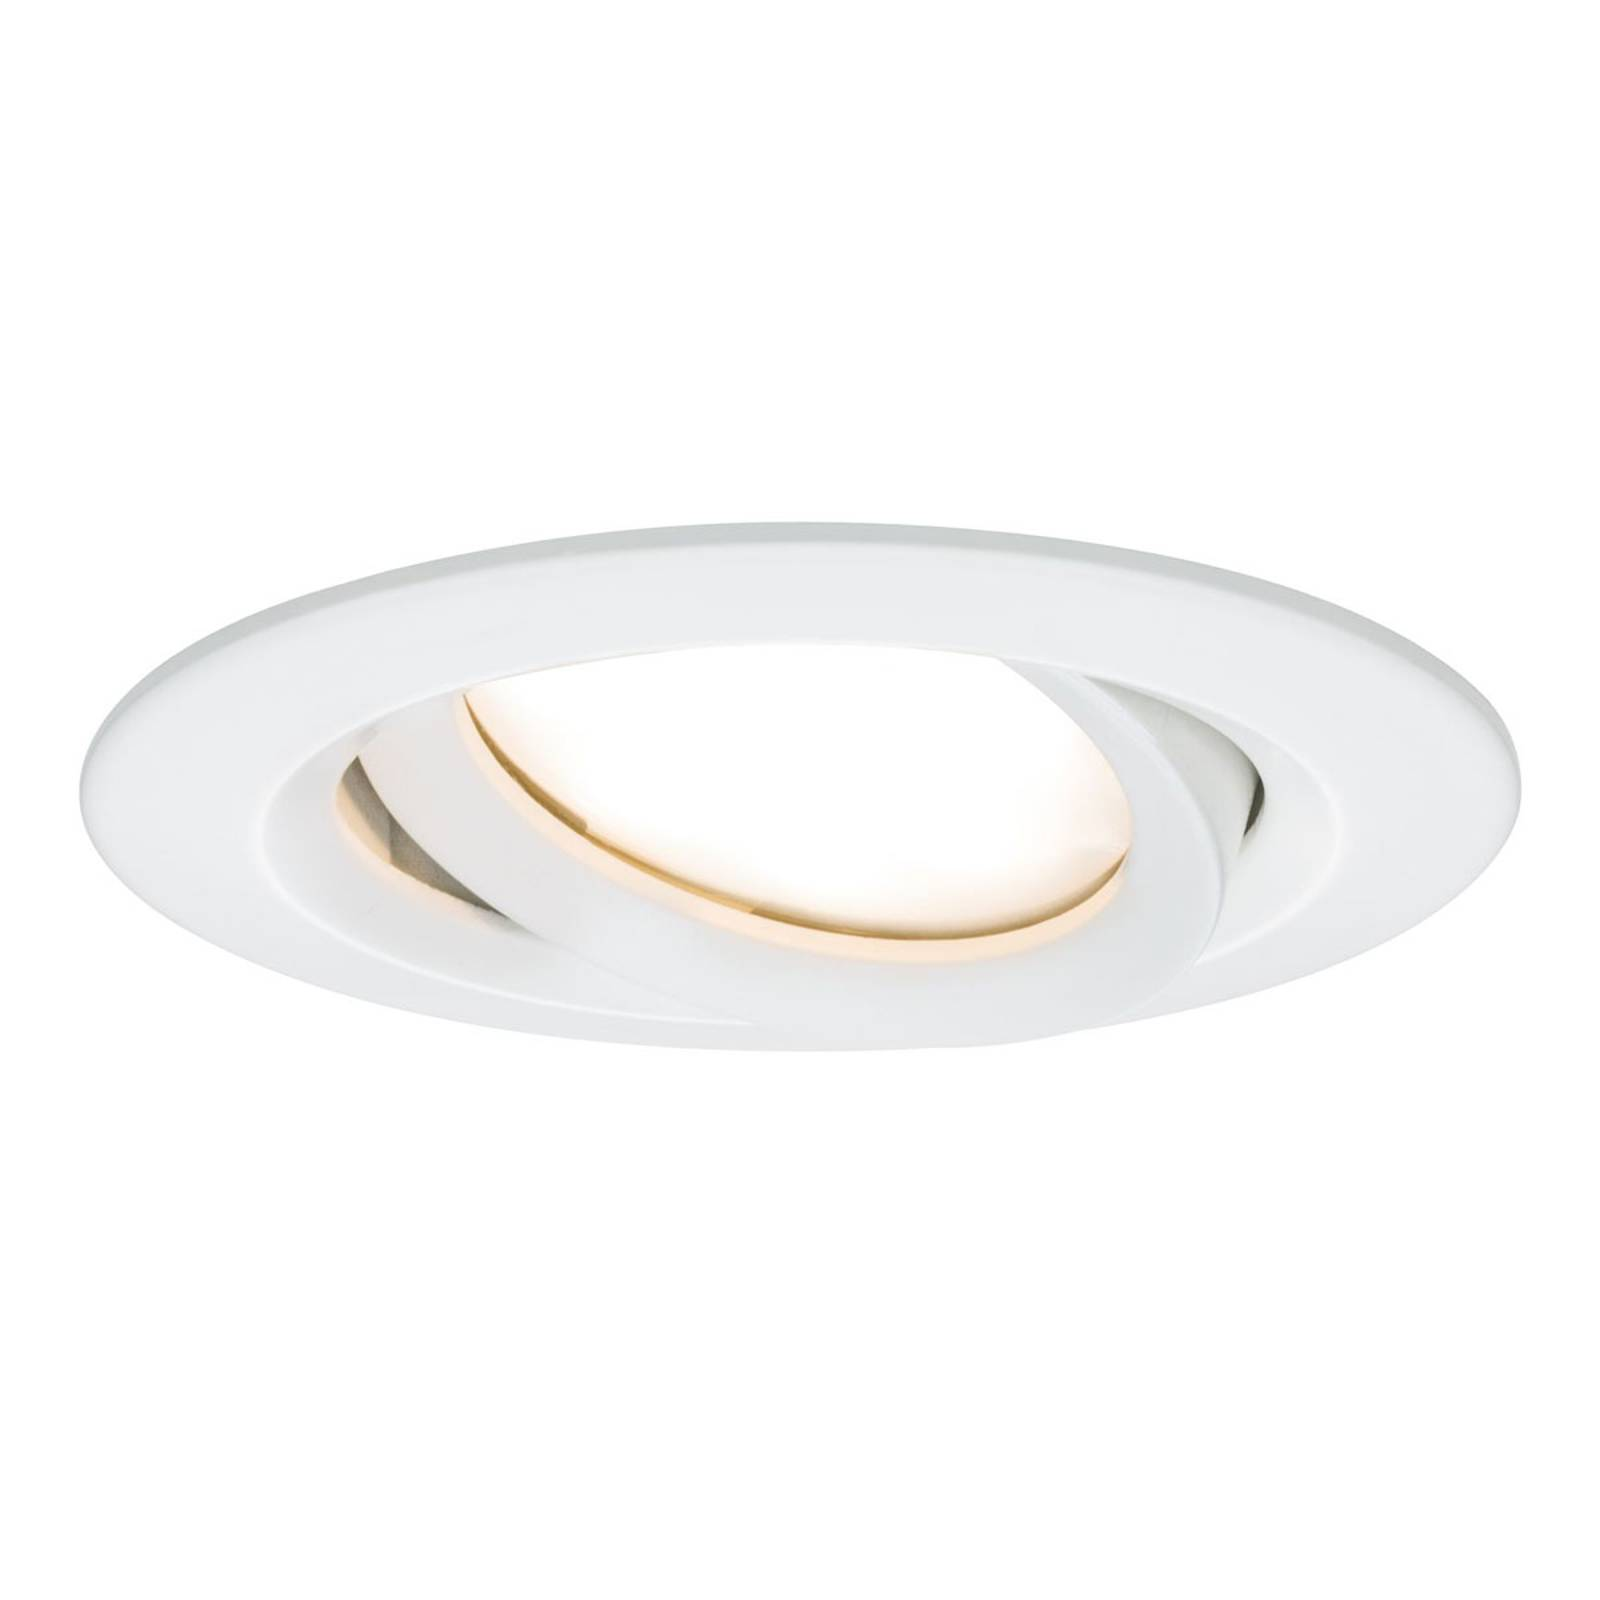 Paulmann Nova Plus -LED-spotti, valkoinen